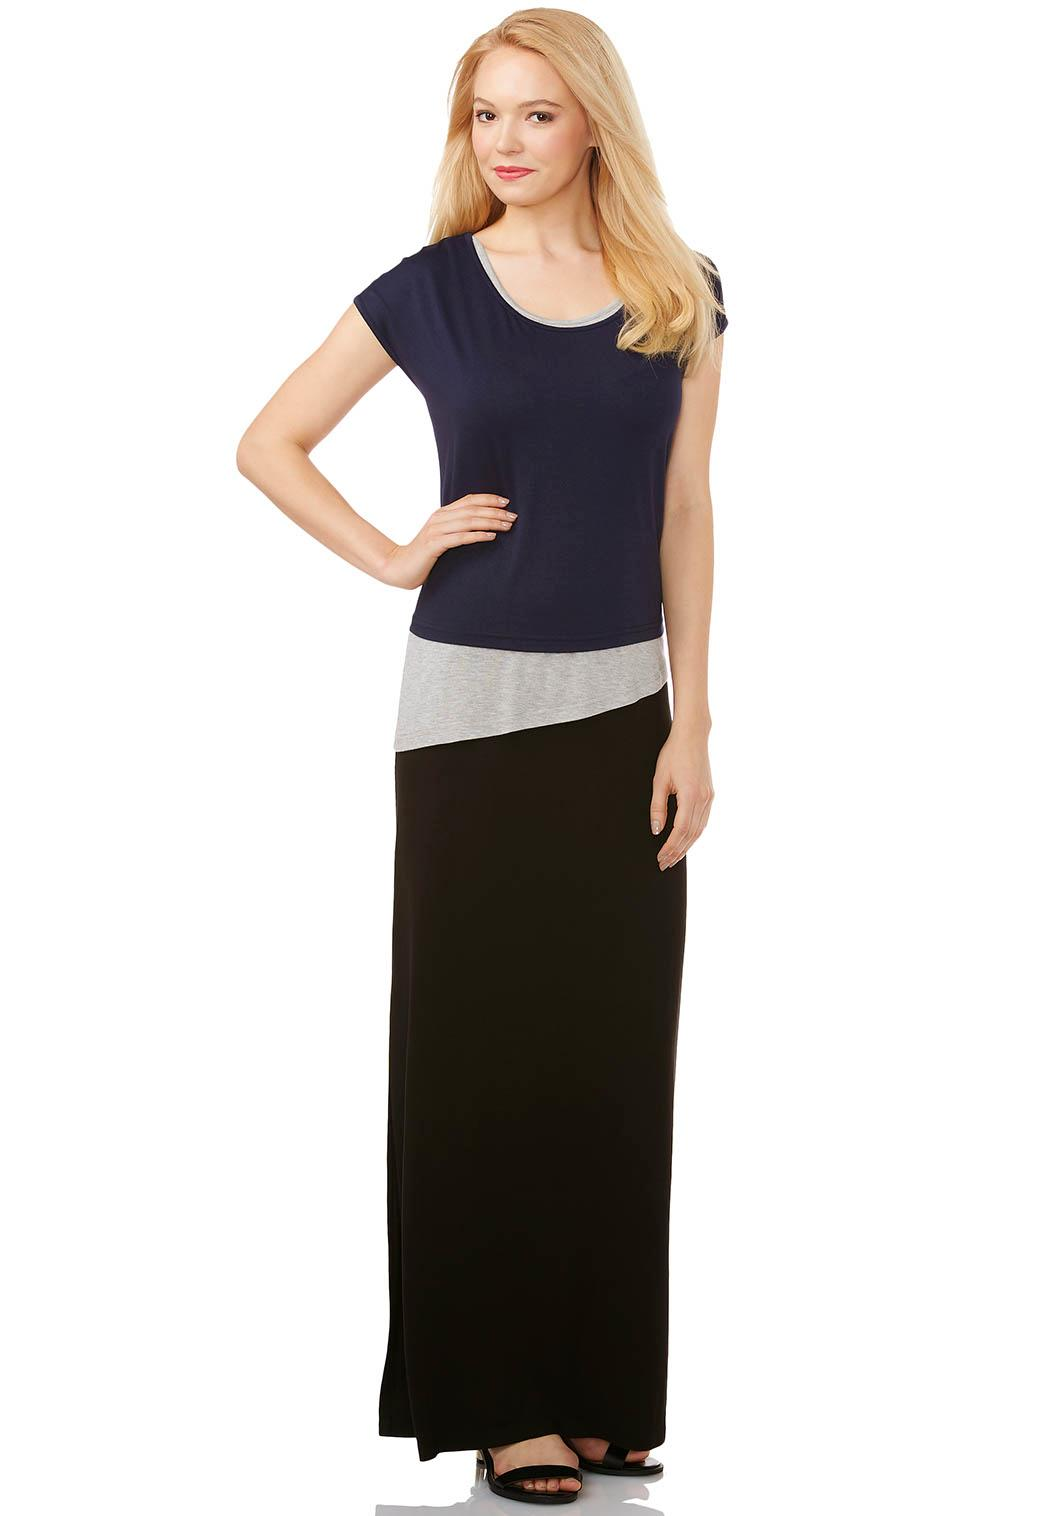 Catofashions.com Dresses Dresses Cato Fashions